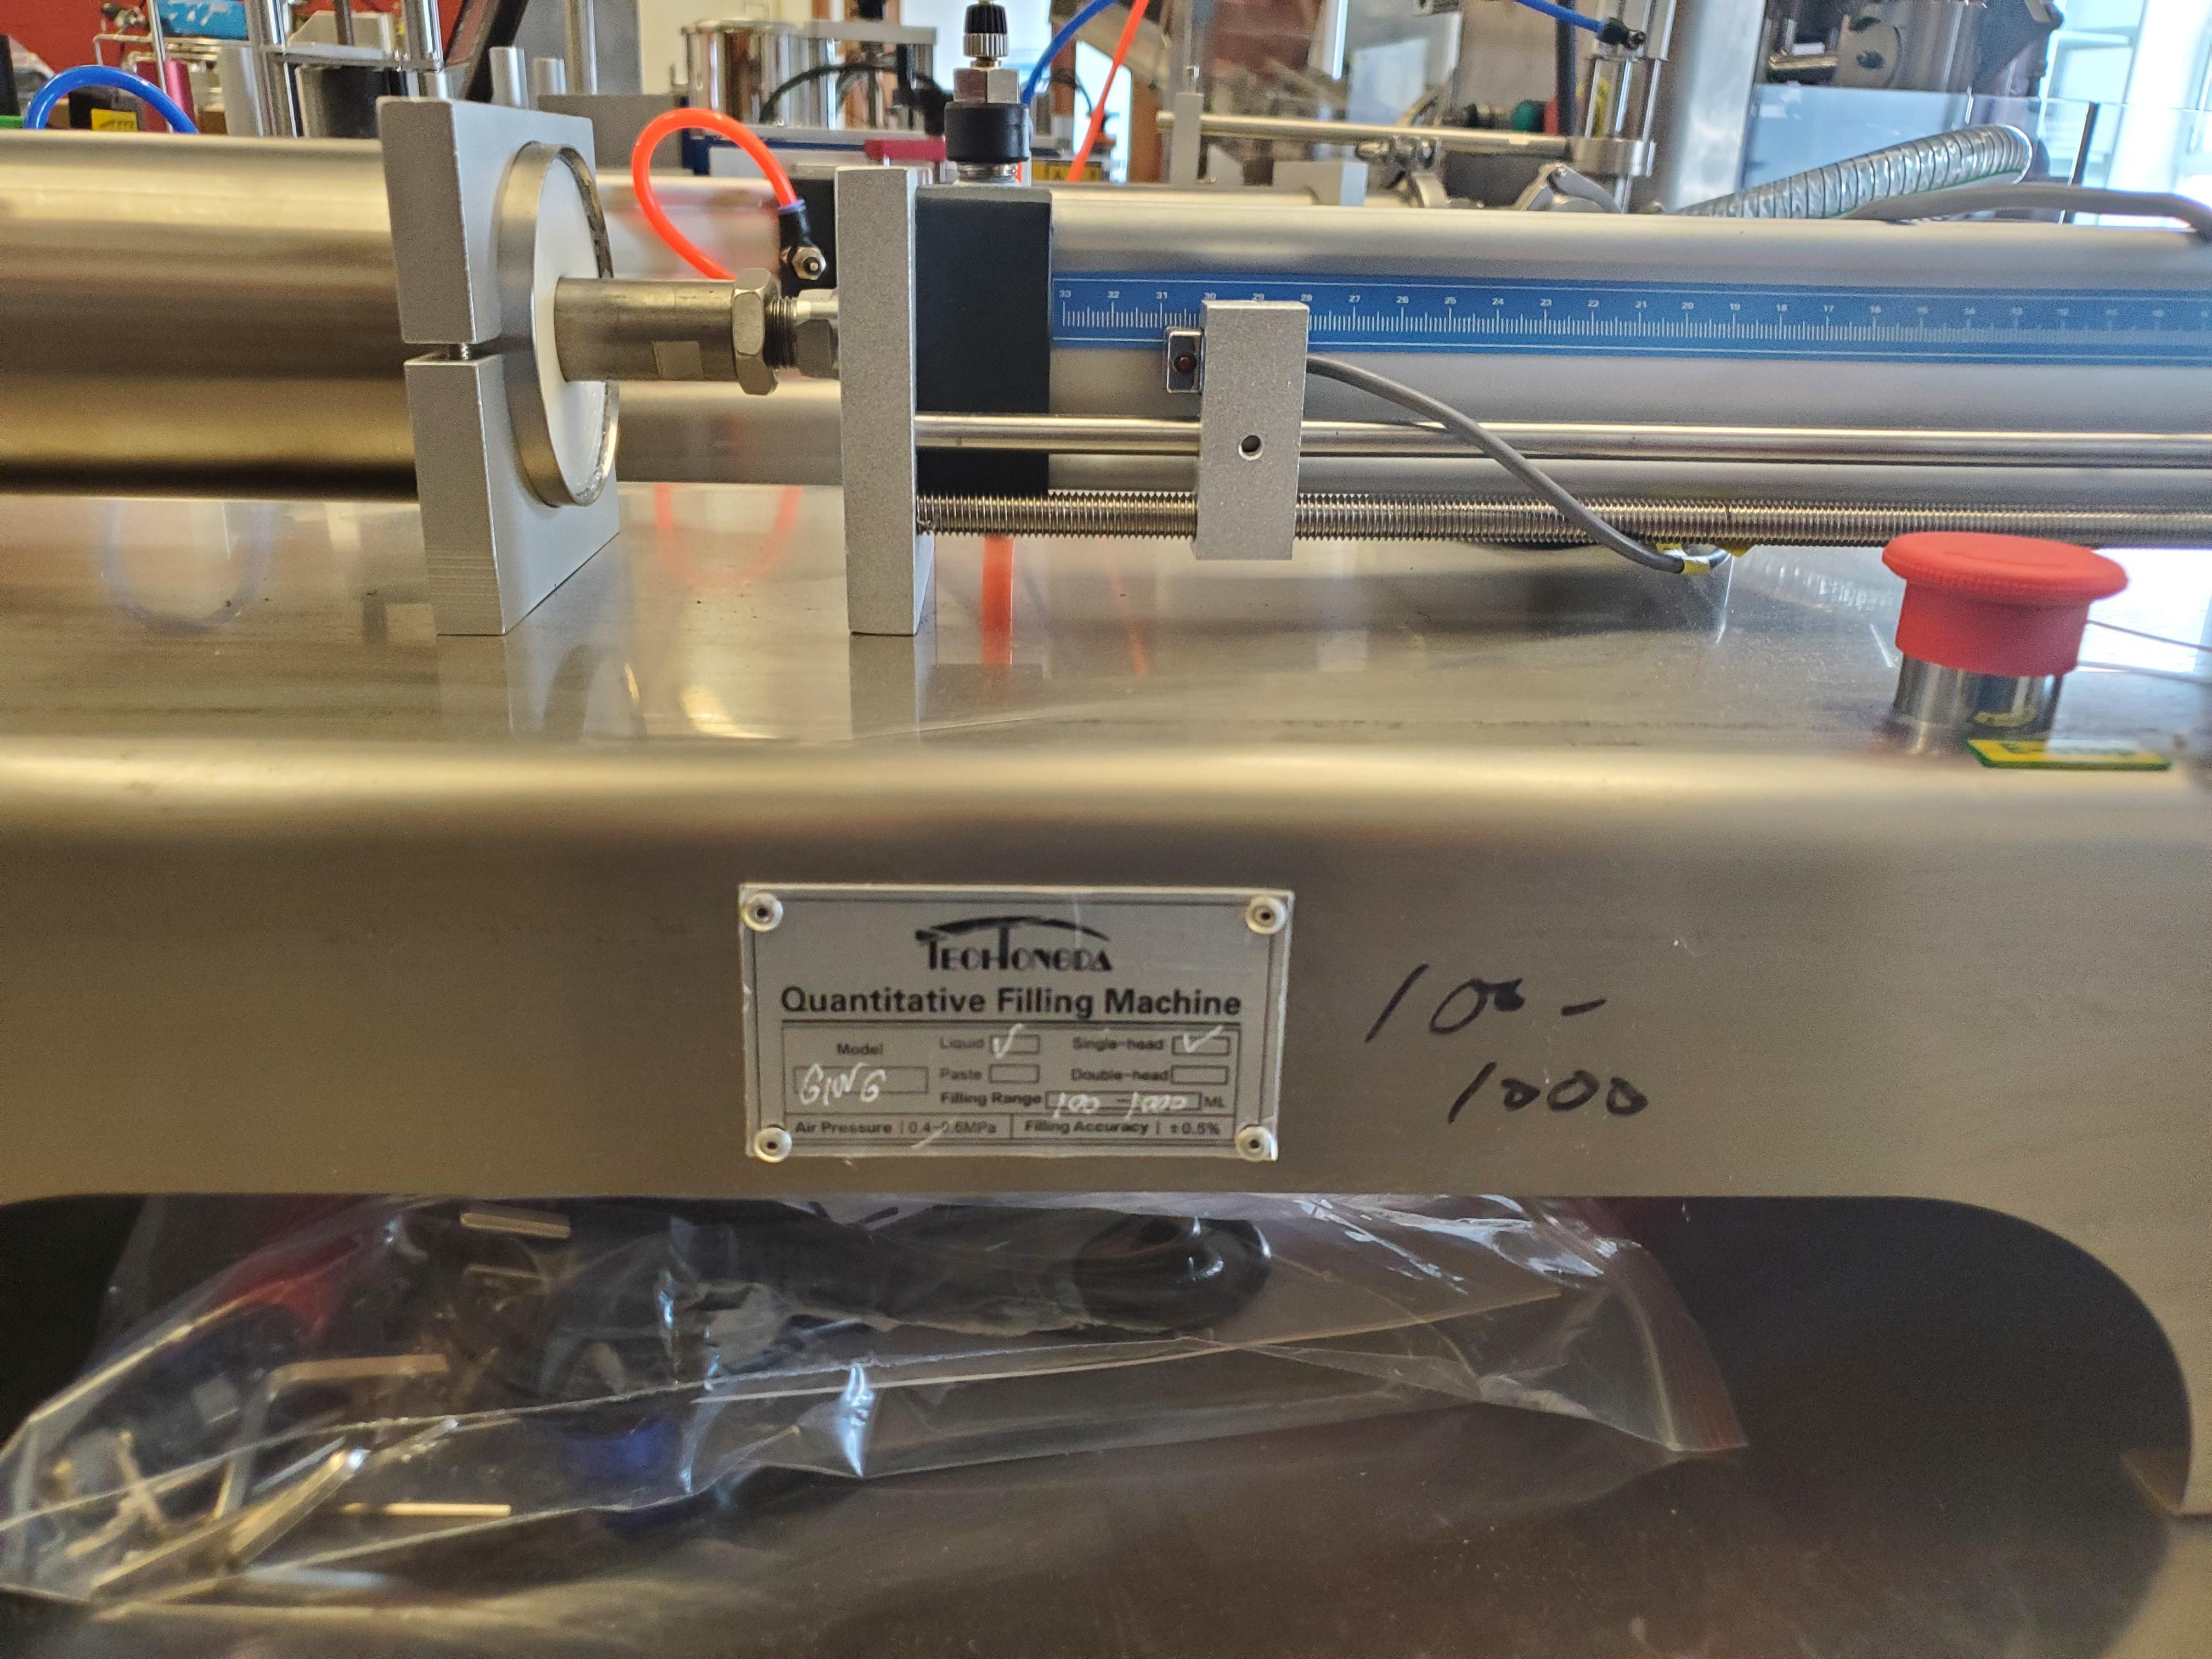 Stainless Steel Horizontal Piston Filler - Table Top Model - Image 3 of 3